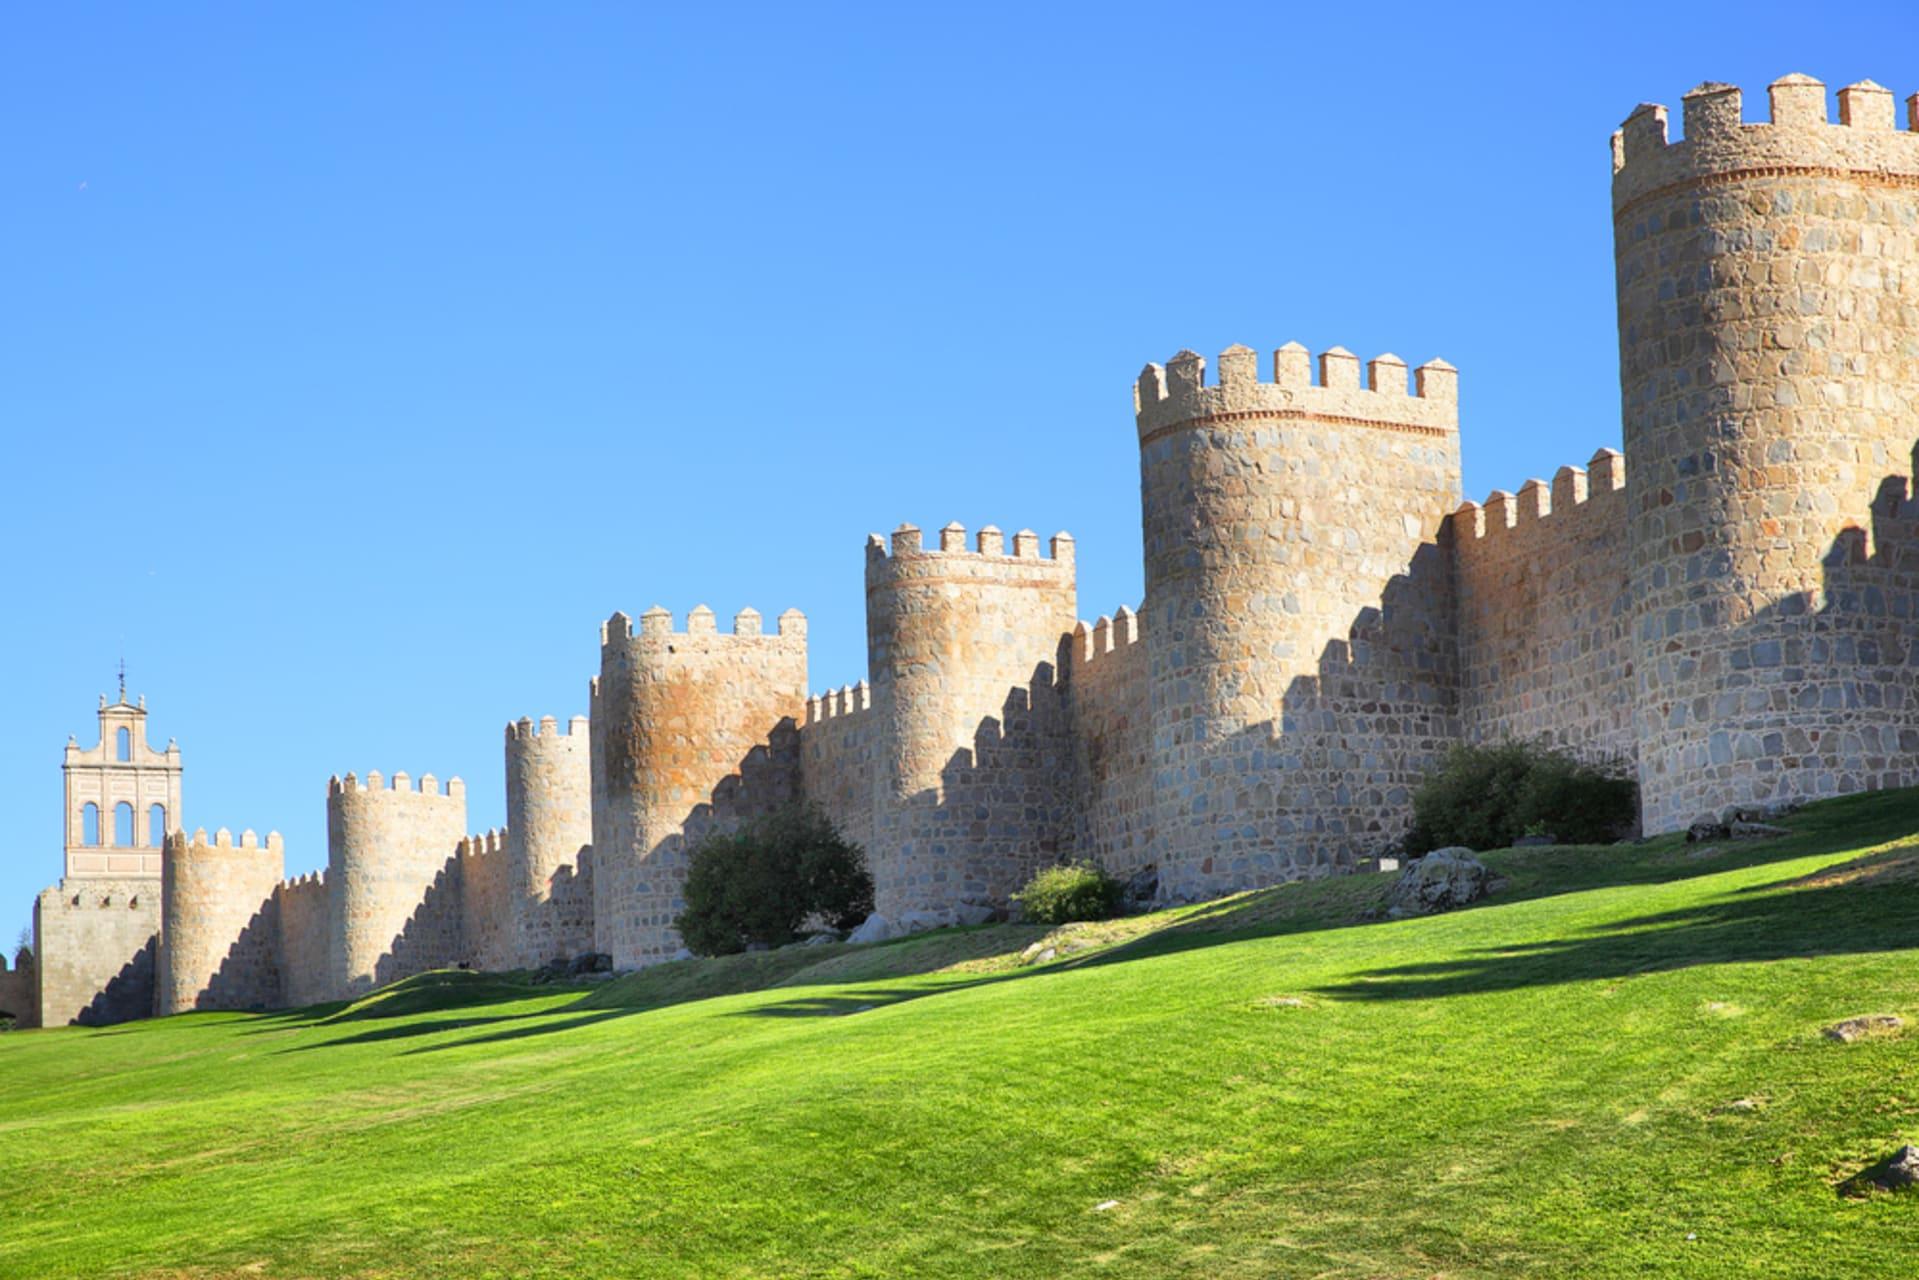 Ávila - Ávila - a Walk on the Unique Medieval Wall - part II